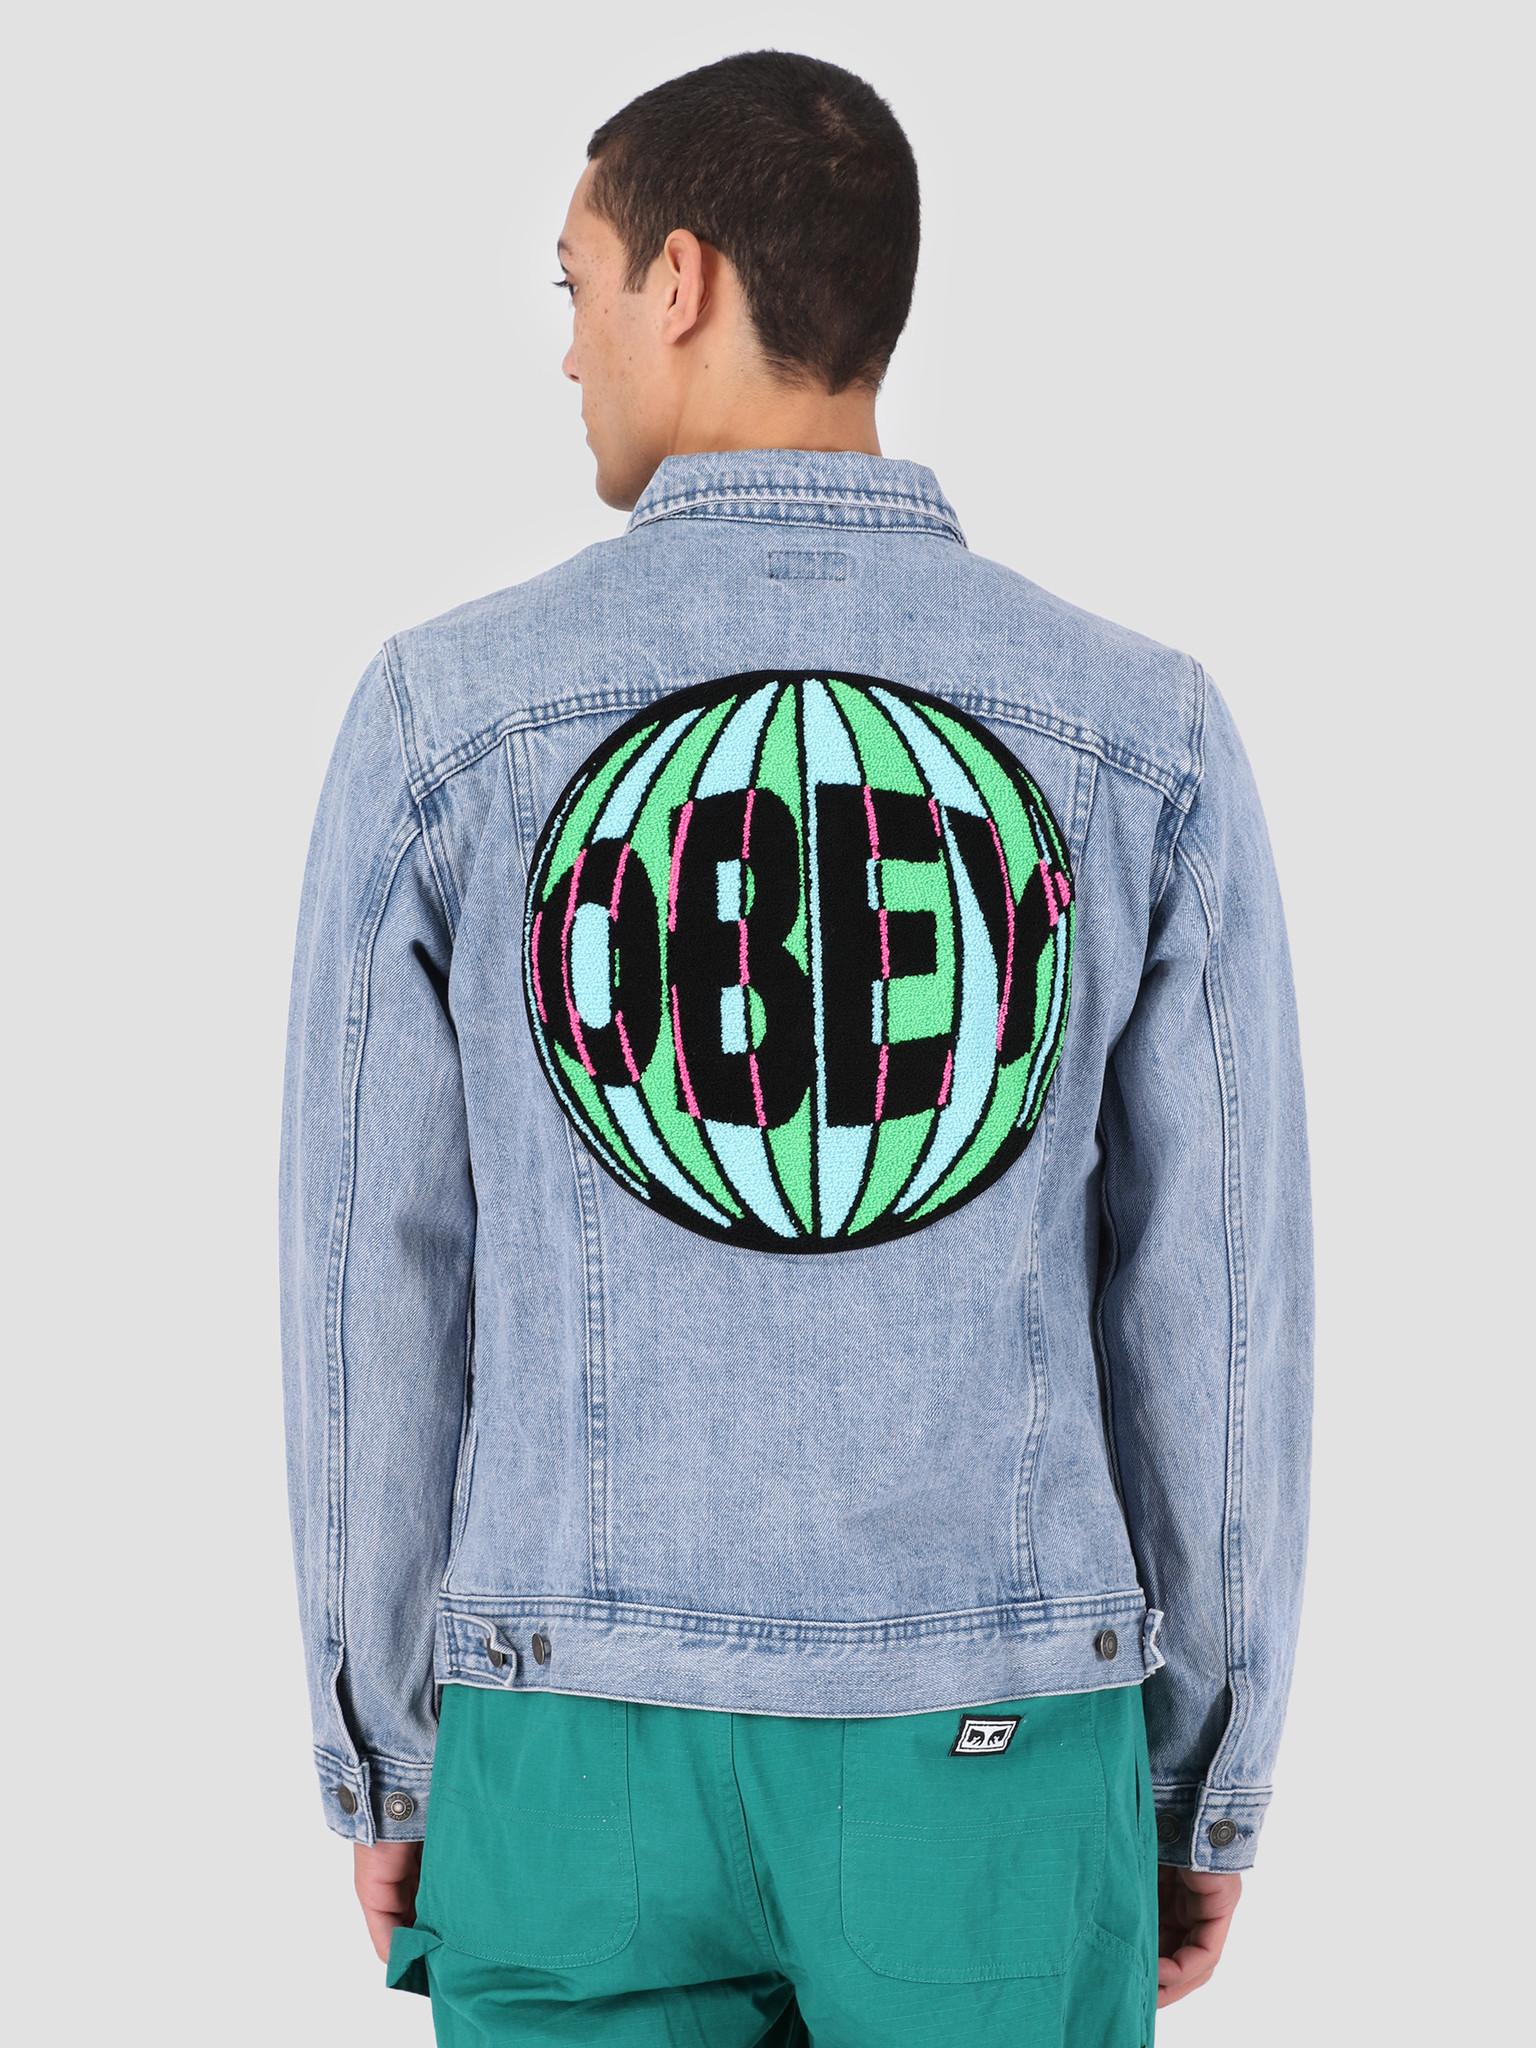 Obey Obey New Reality Denim Jacket LIN 121800367